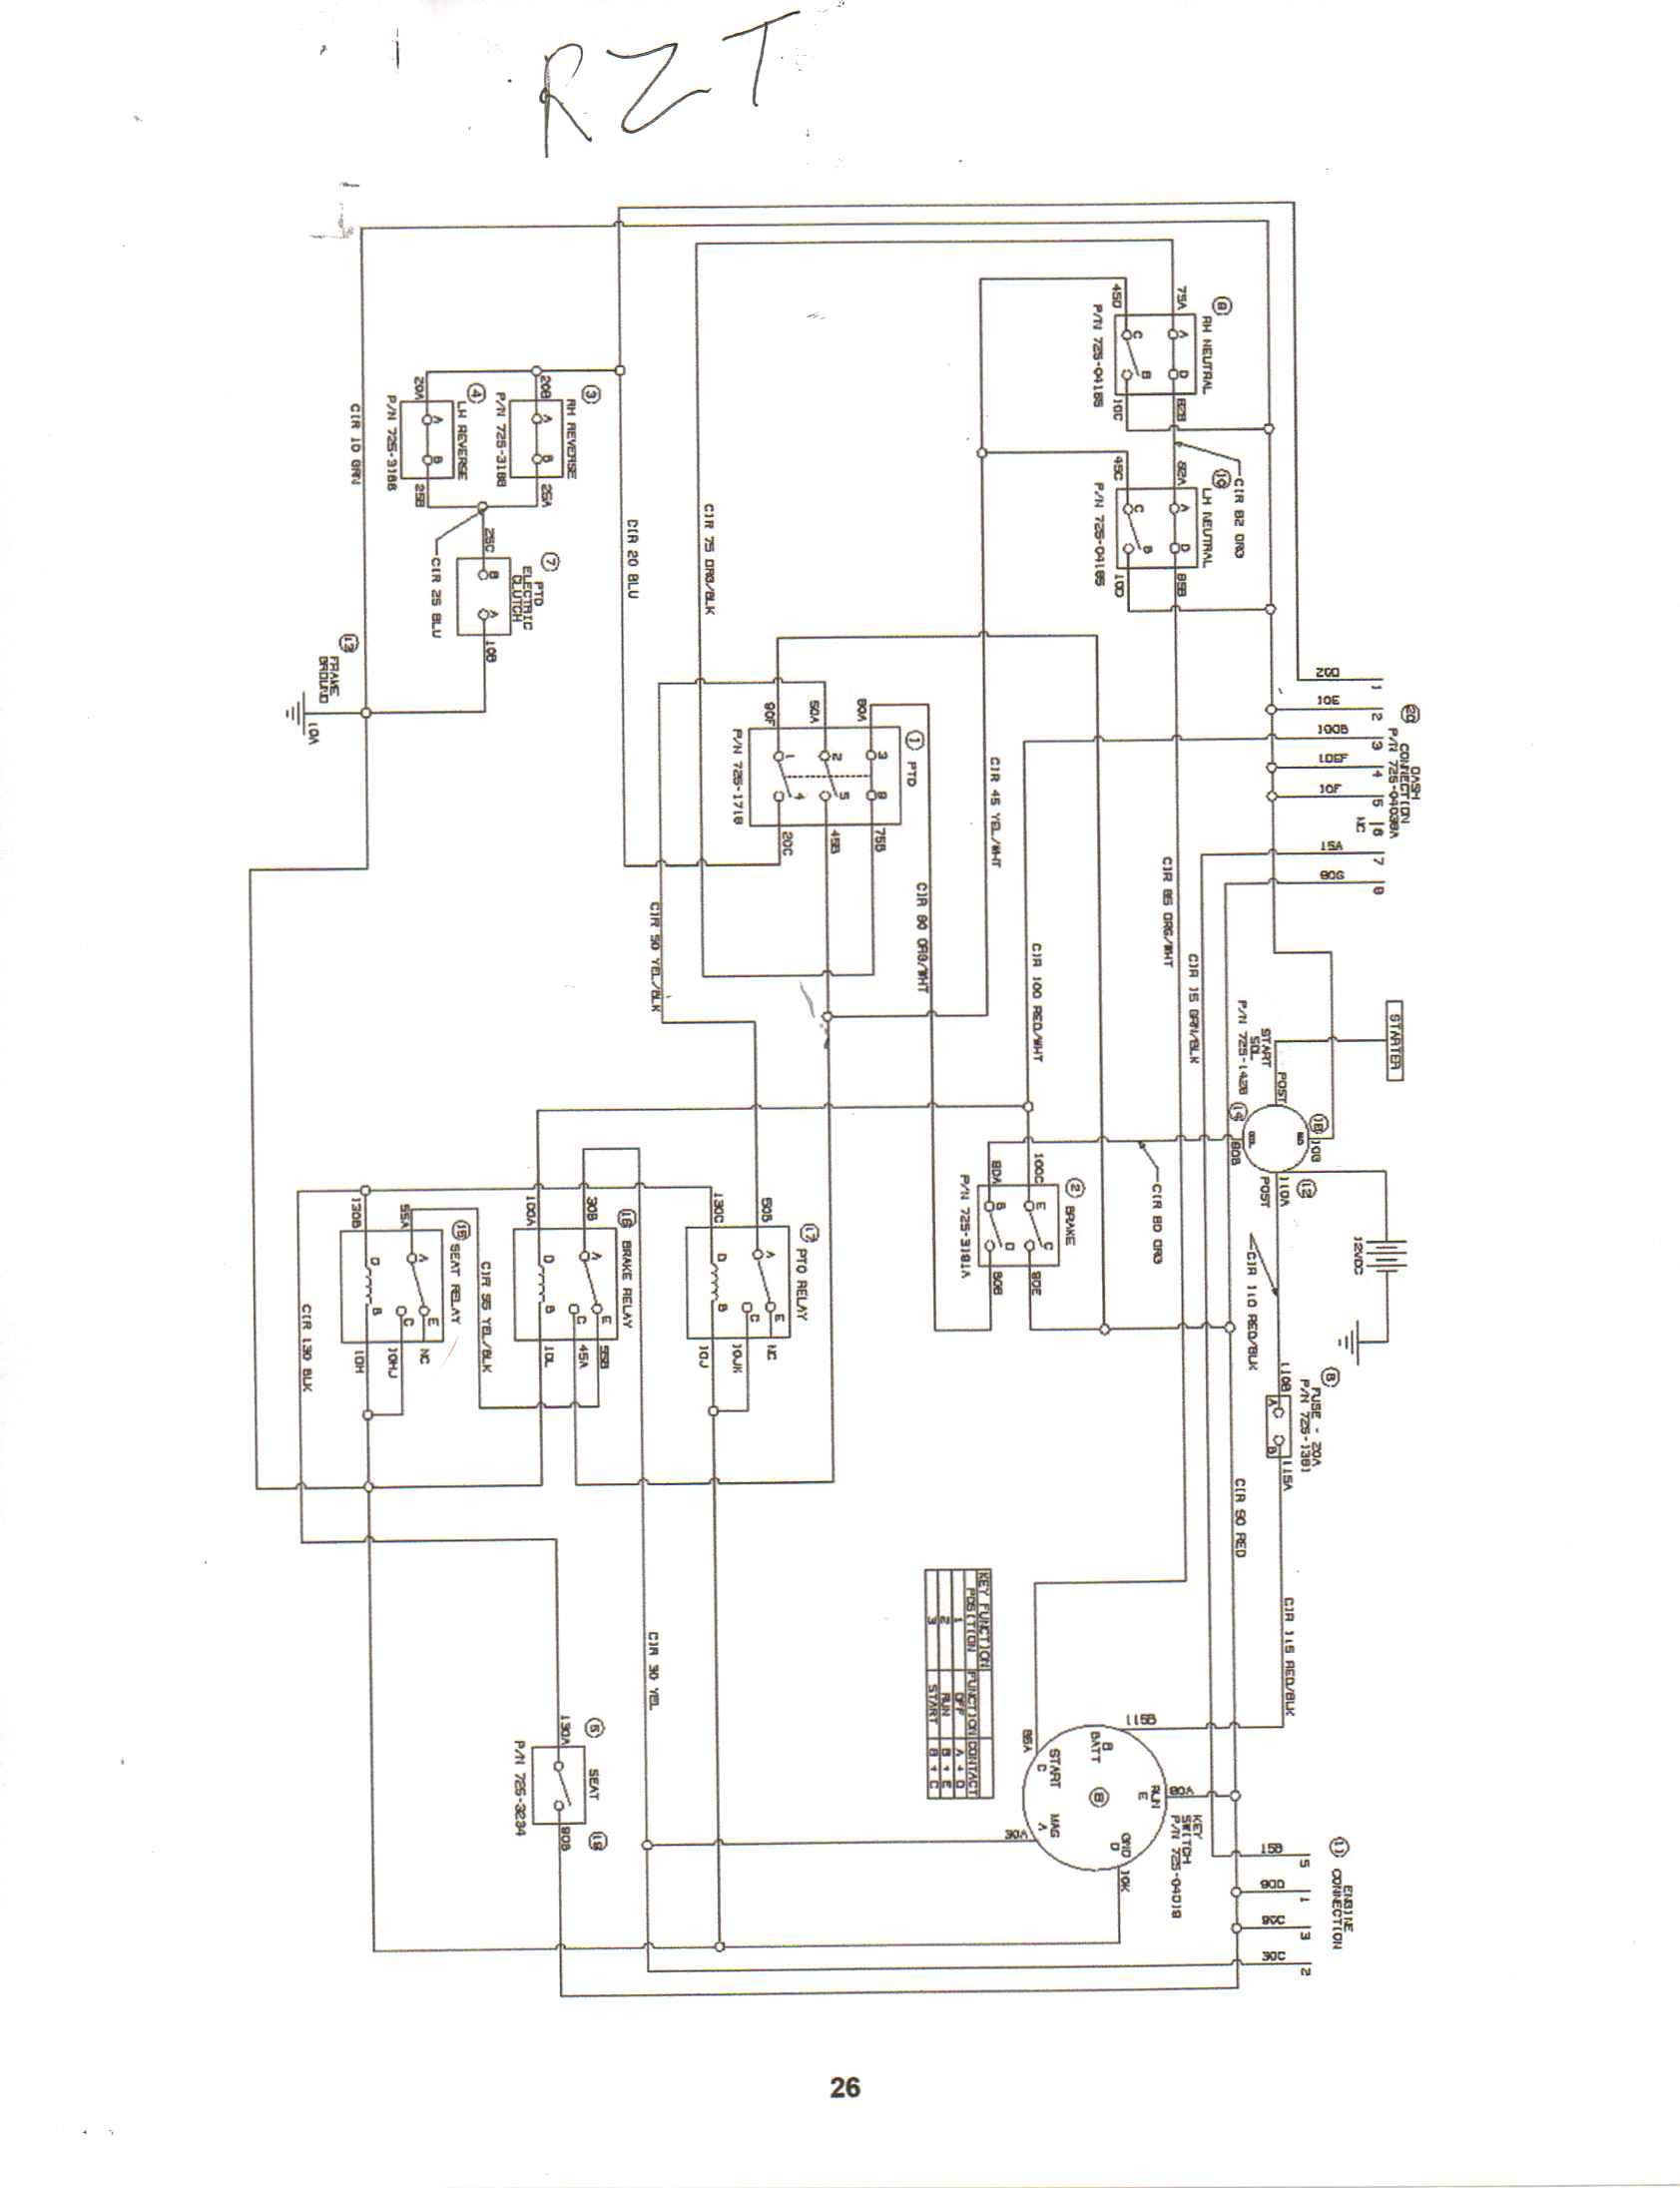 [SCHEMATICS_4JK]  DY_9028] Wire Schematic For A Cub Cadet Rzt 50 Schematic Wiring | Cub Cadet Rzt 50 Schematic |  | Props Caba Viewor Flui Opein Mohammedshrine Librar Wiring 101